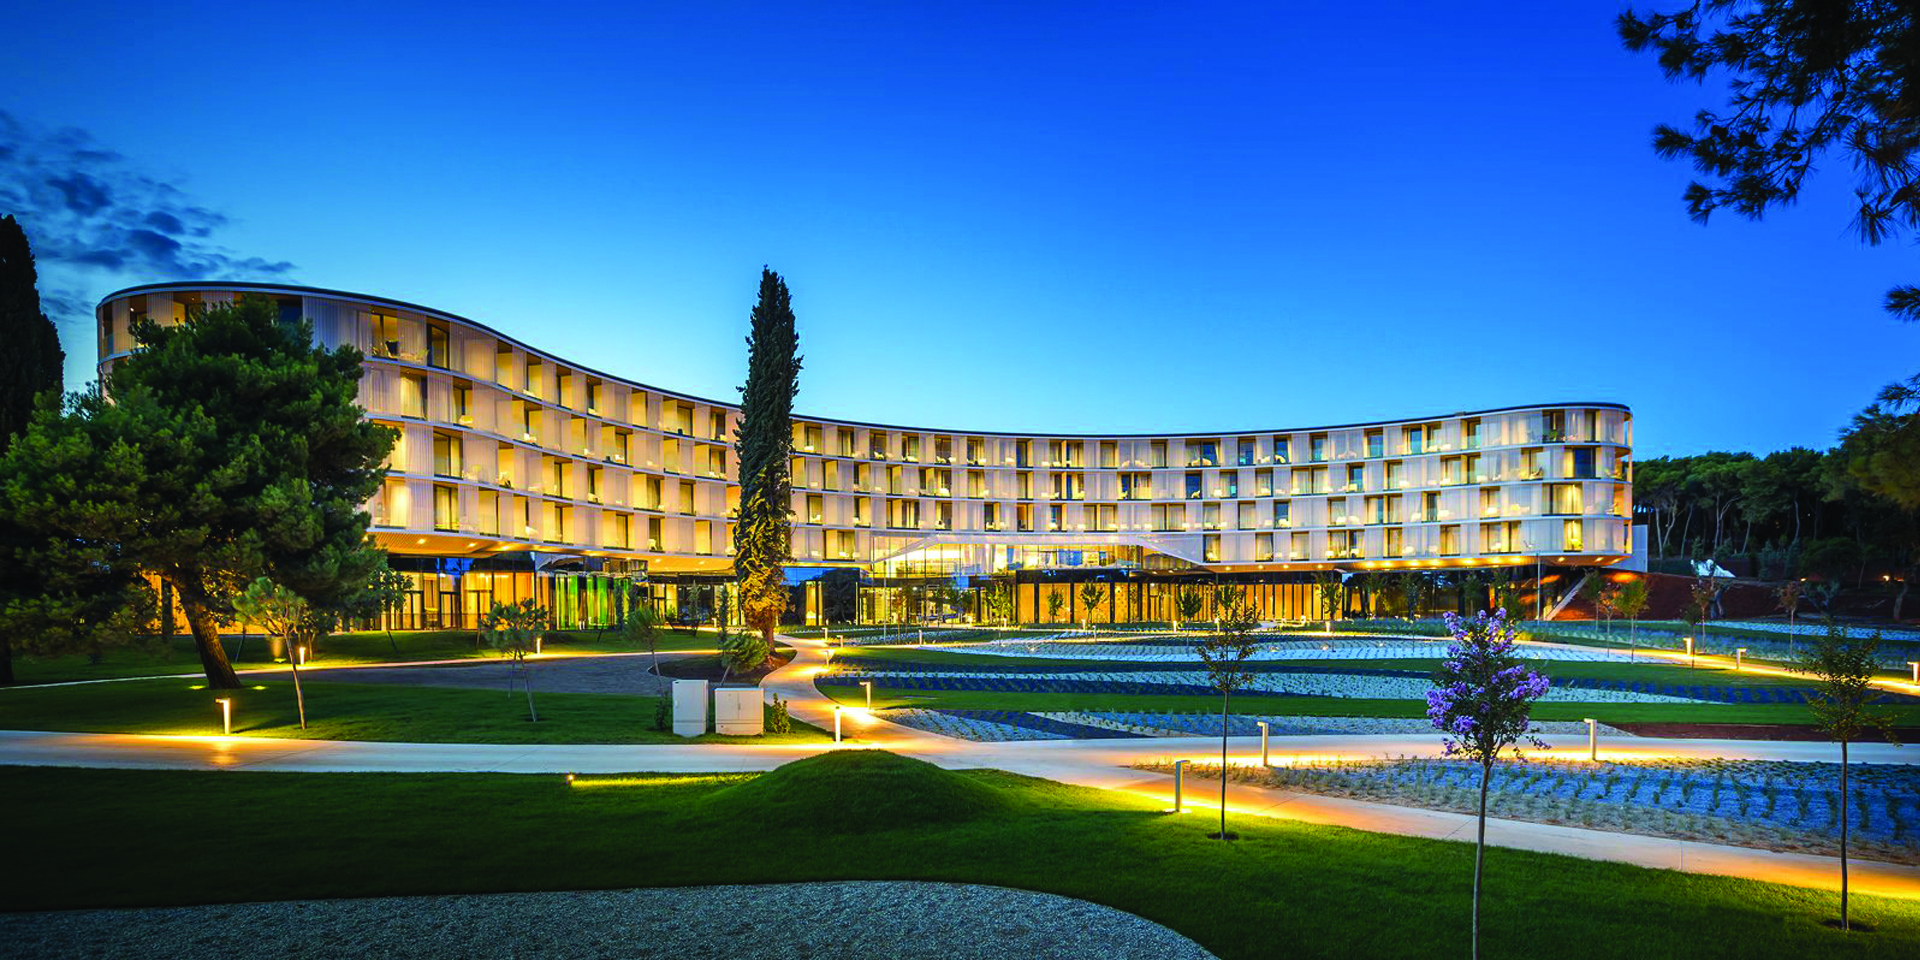 Croatia s hotel amarin is a design delight for Design hotel croatia